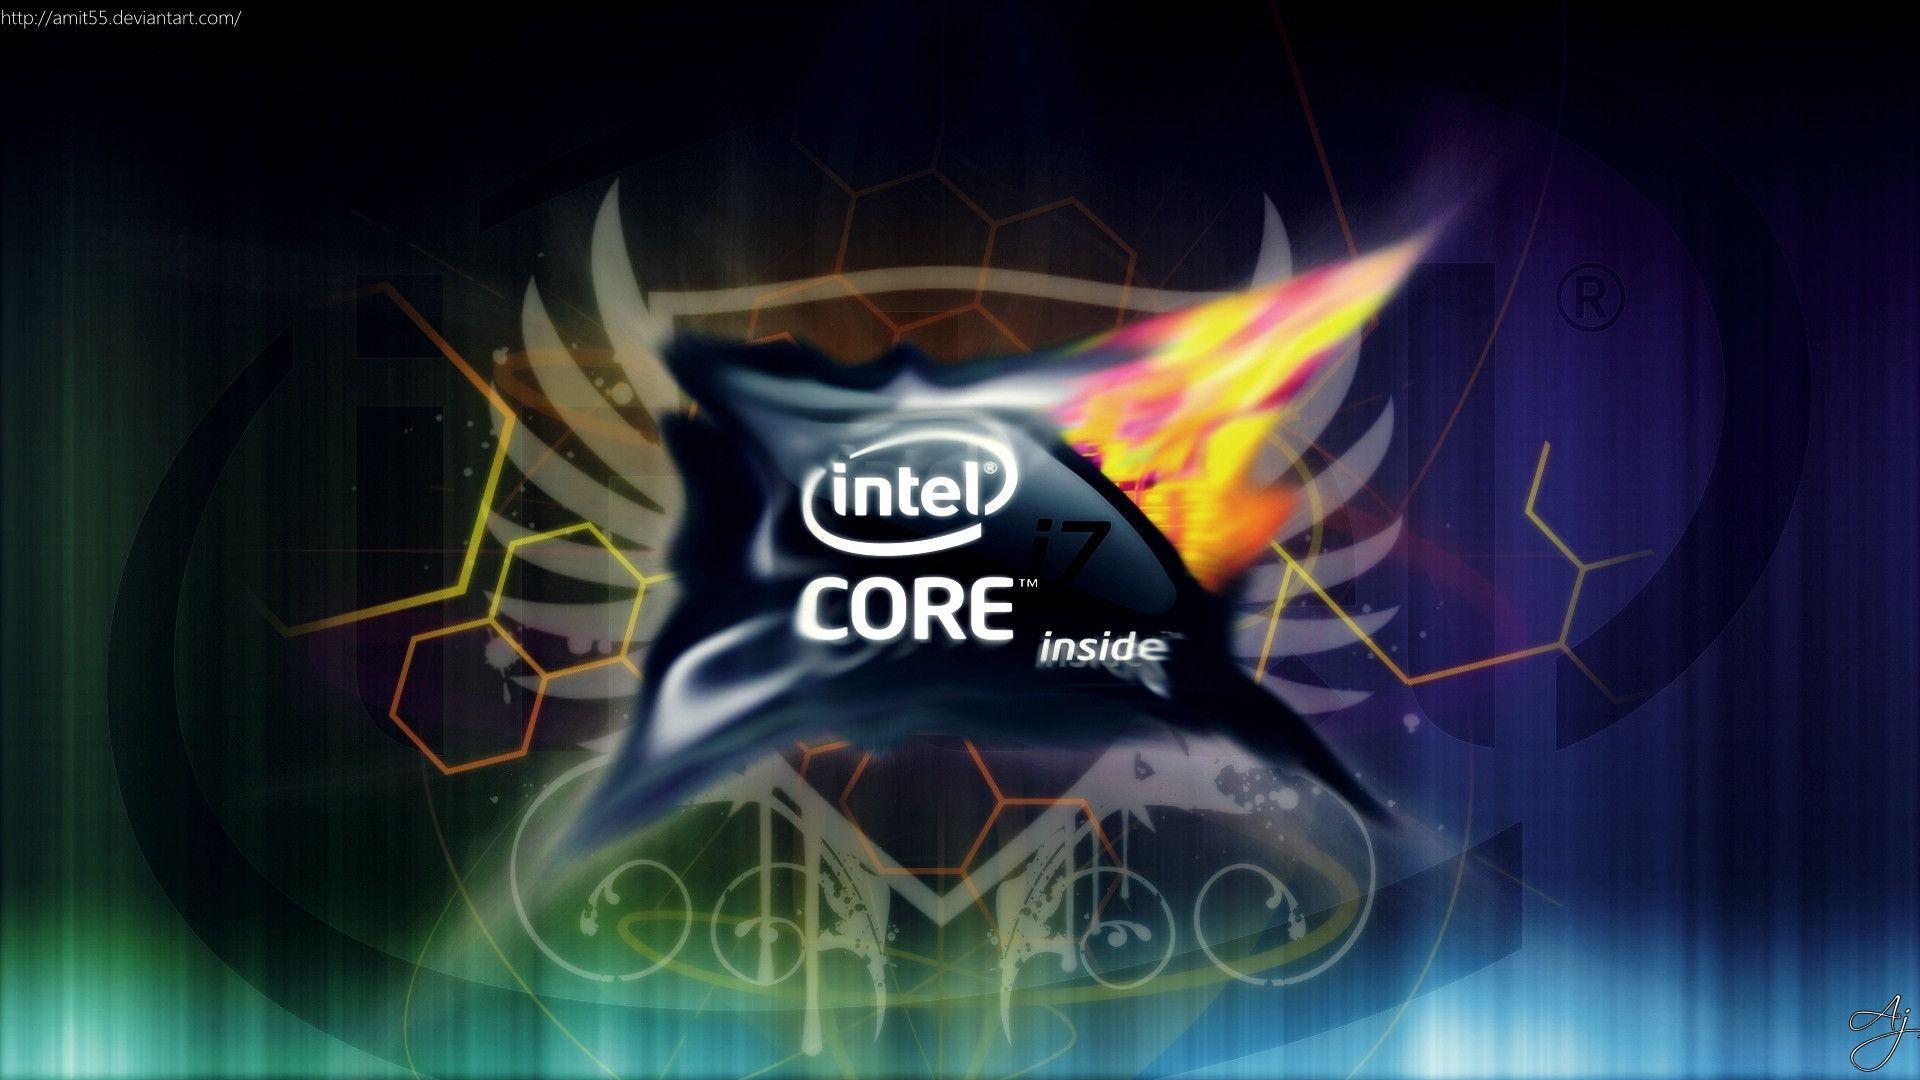 Intel wallpapers wallpaper cave for Immagini full hd 1920x1080